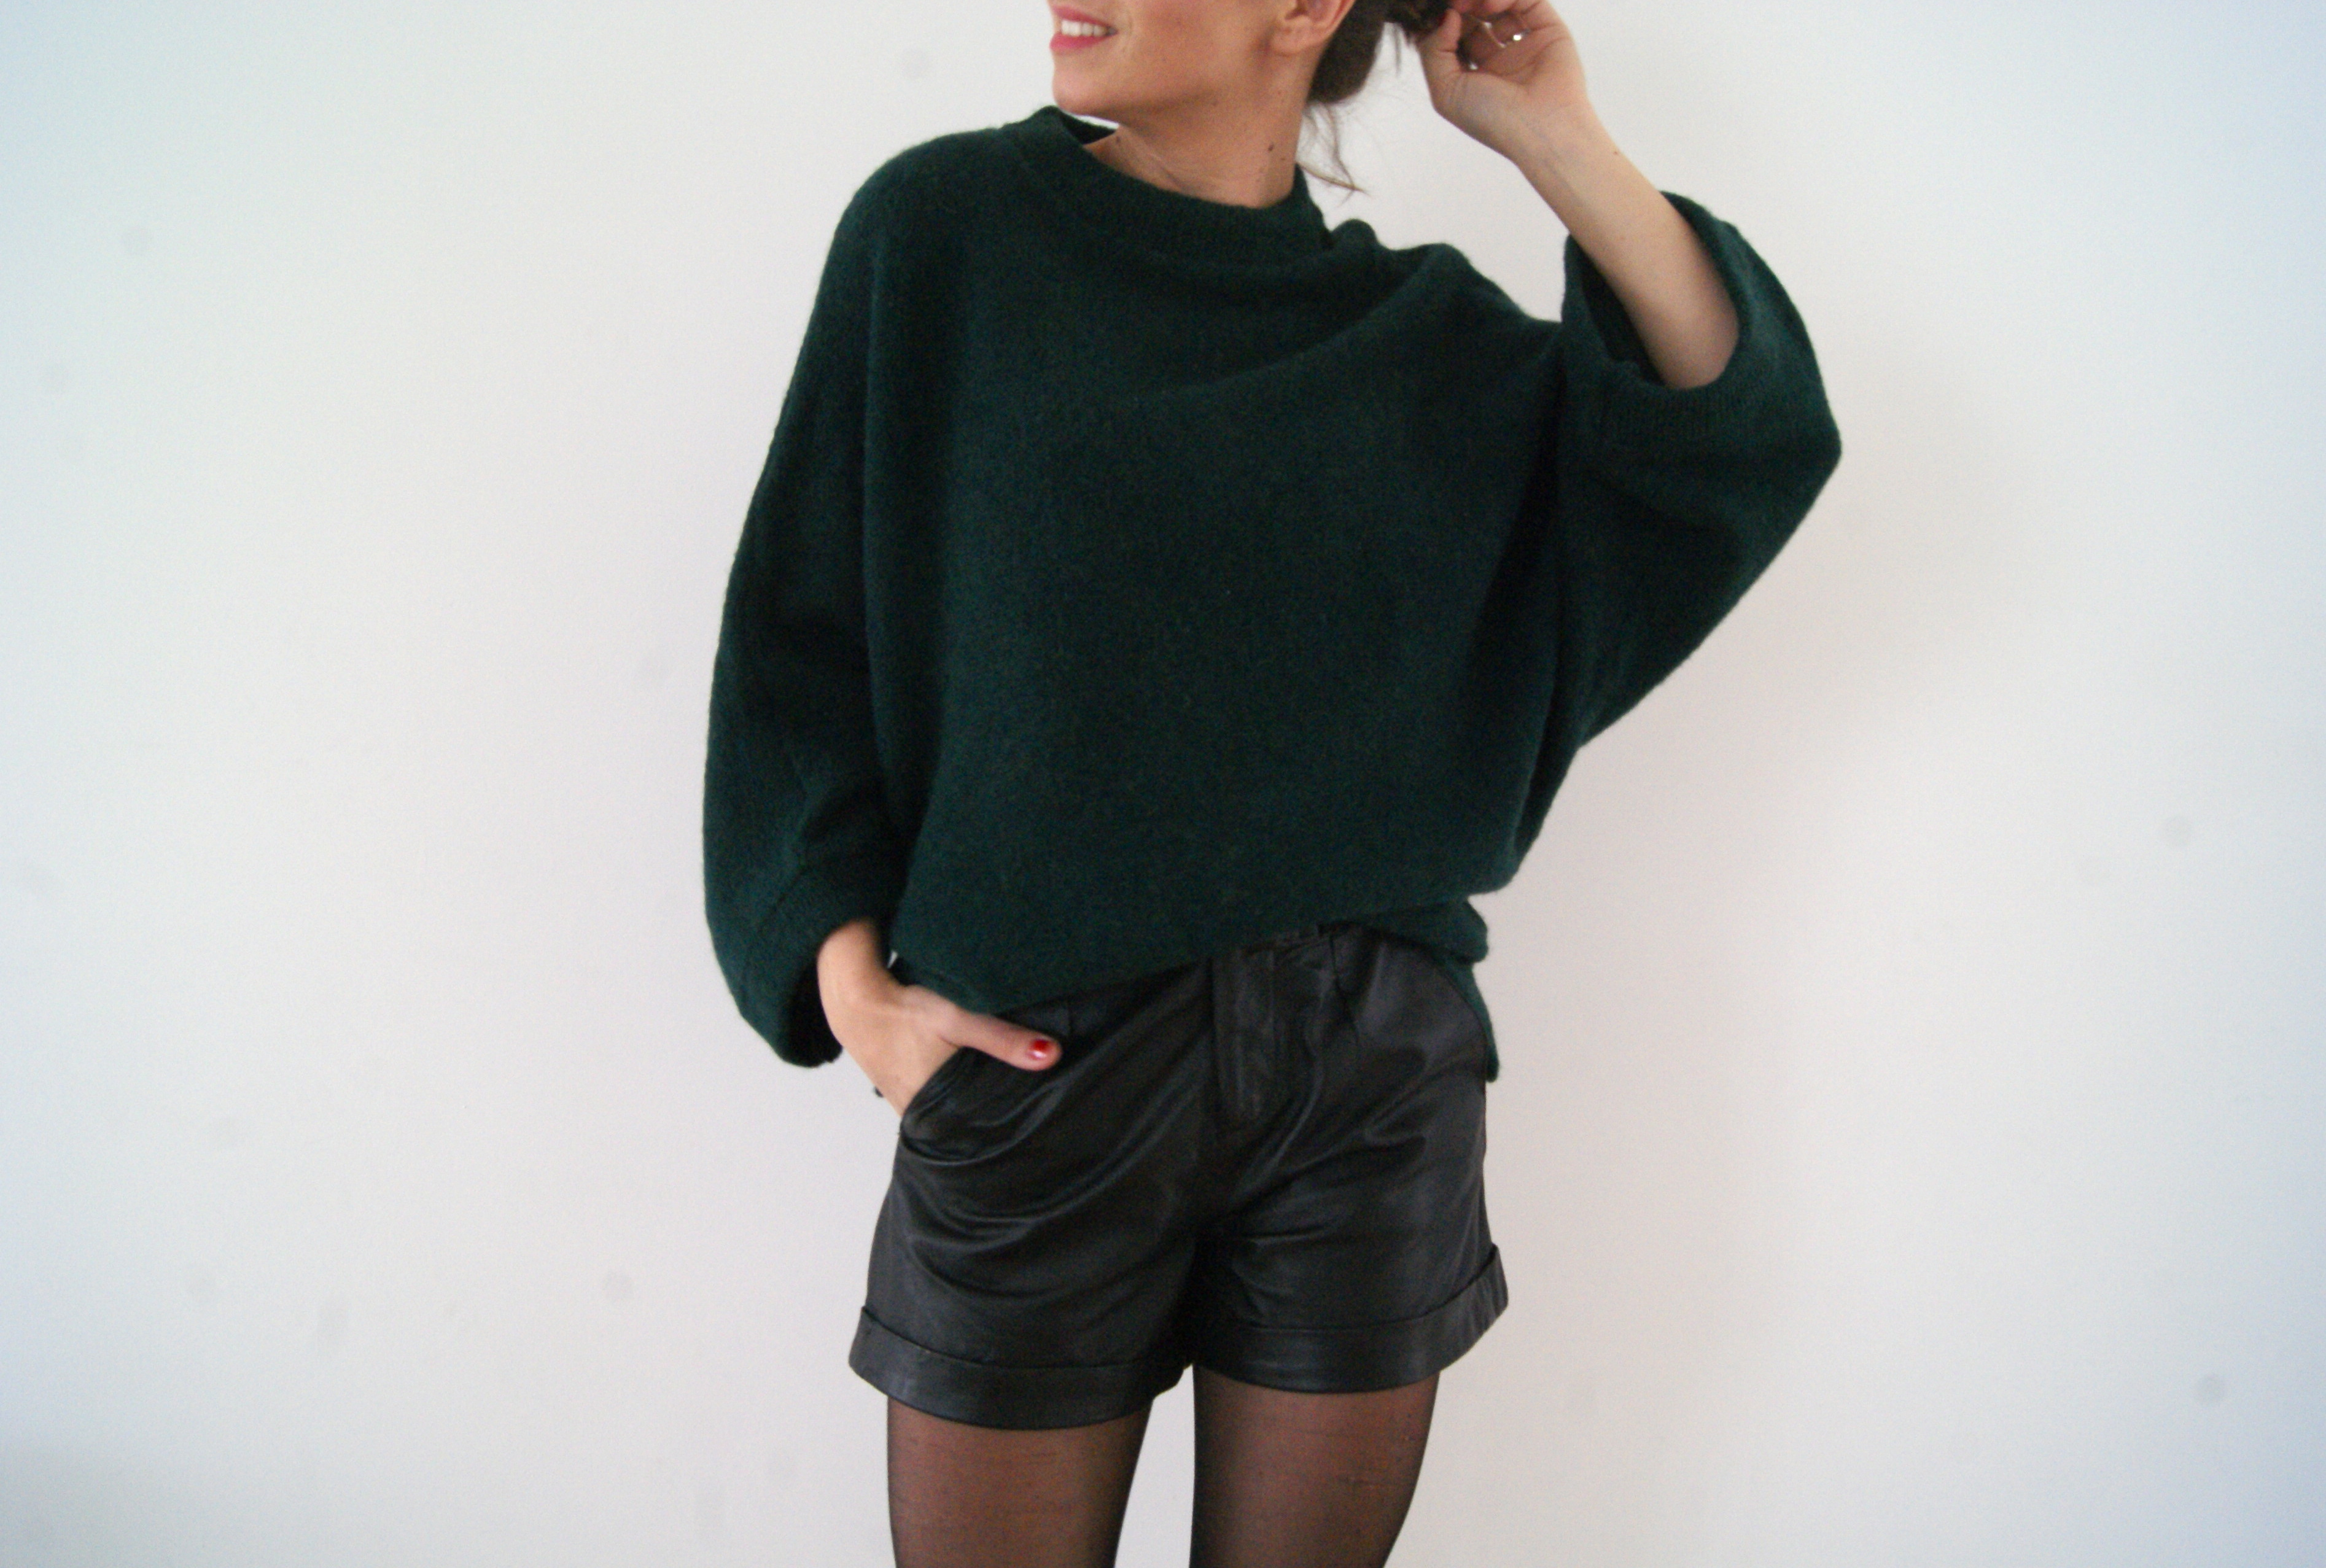 – Mode Sapin Blog Malau Lifestyle amp; Aurélie Vert Beauté 54nfqz